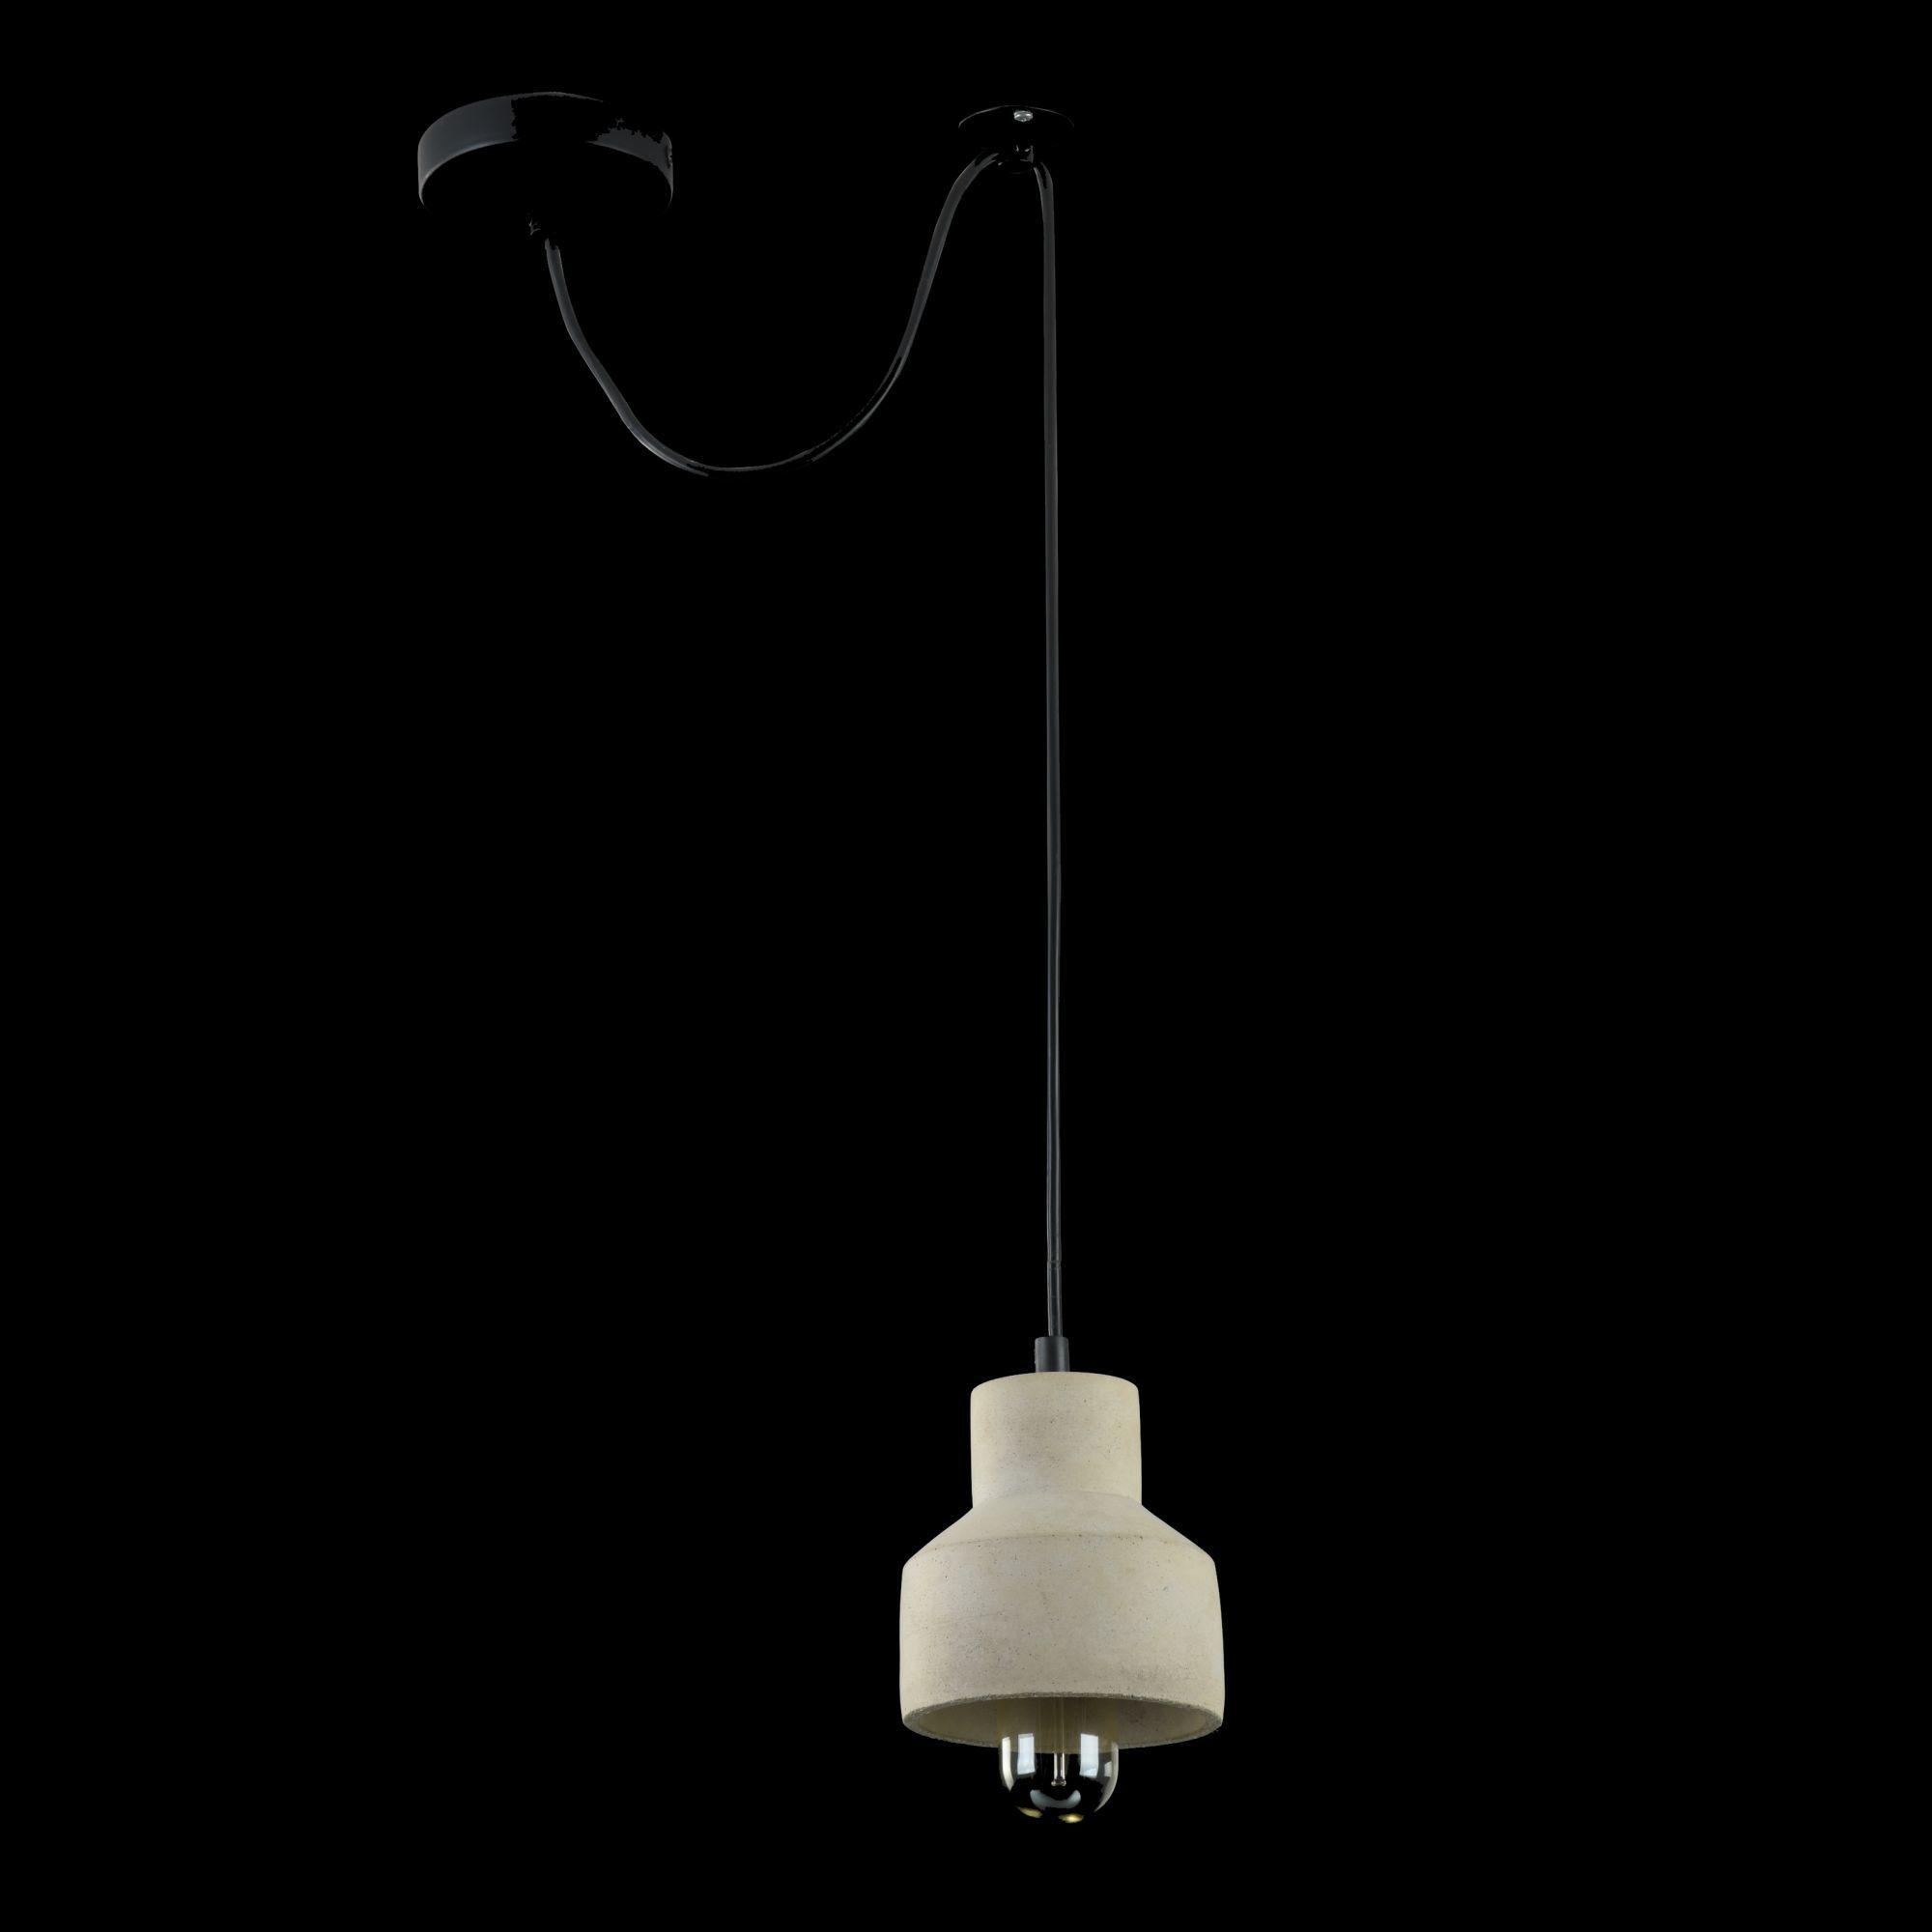 Подвесной светильник Maytoni Broni T437-PL-01-GR, 1xE27x60W, черный, серый, металл, бетон - фото 3